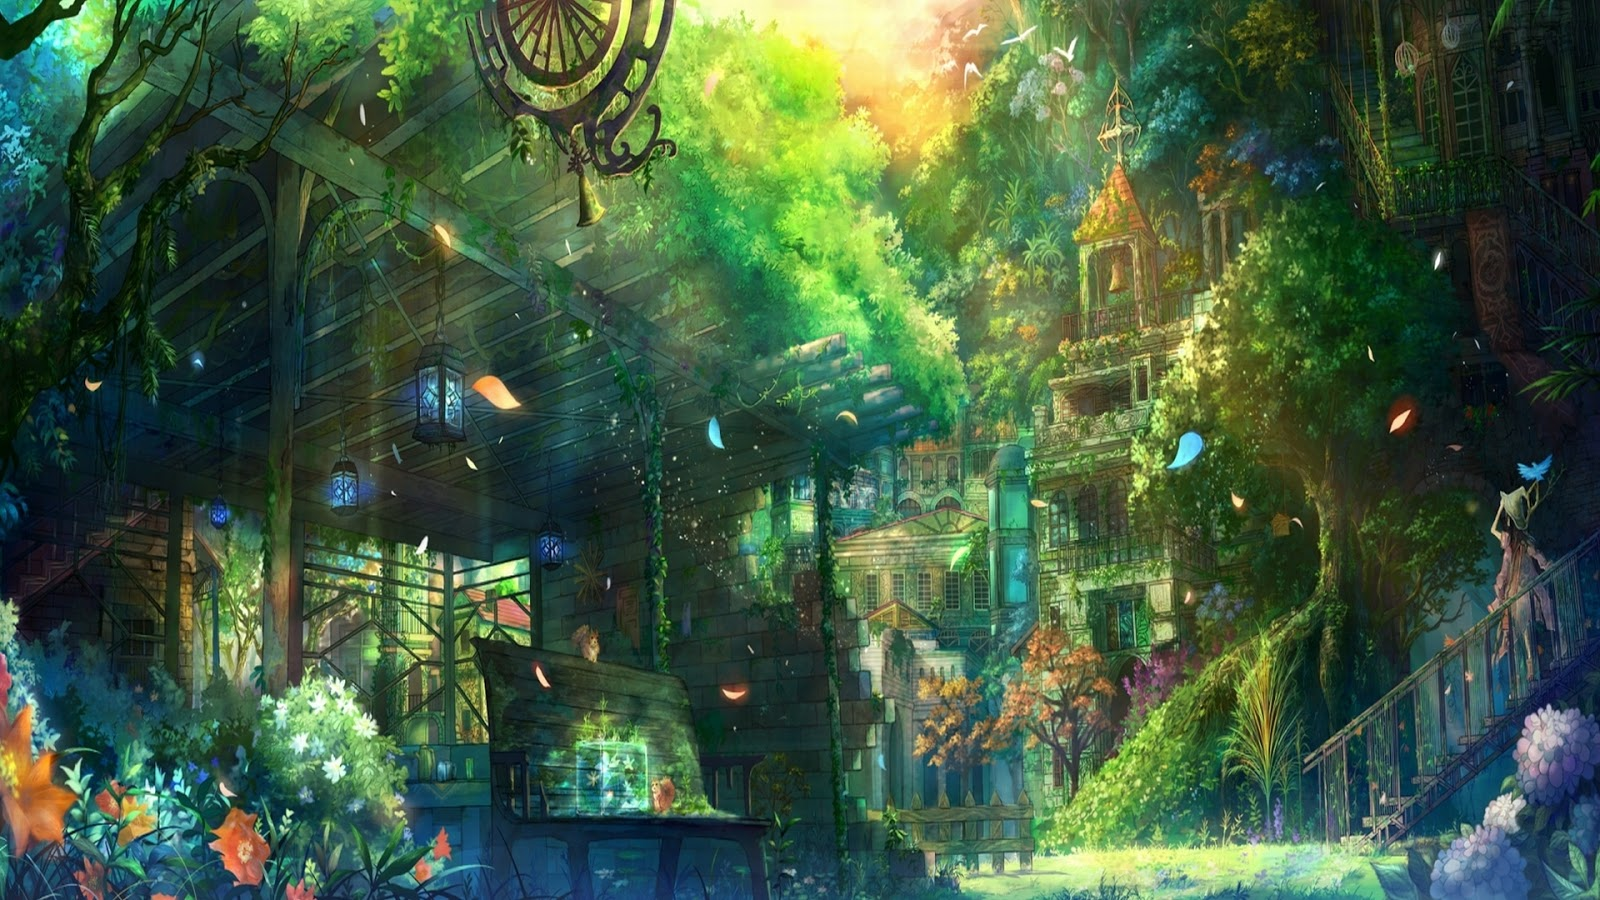 art-fantasy-1250062.jpeg